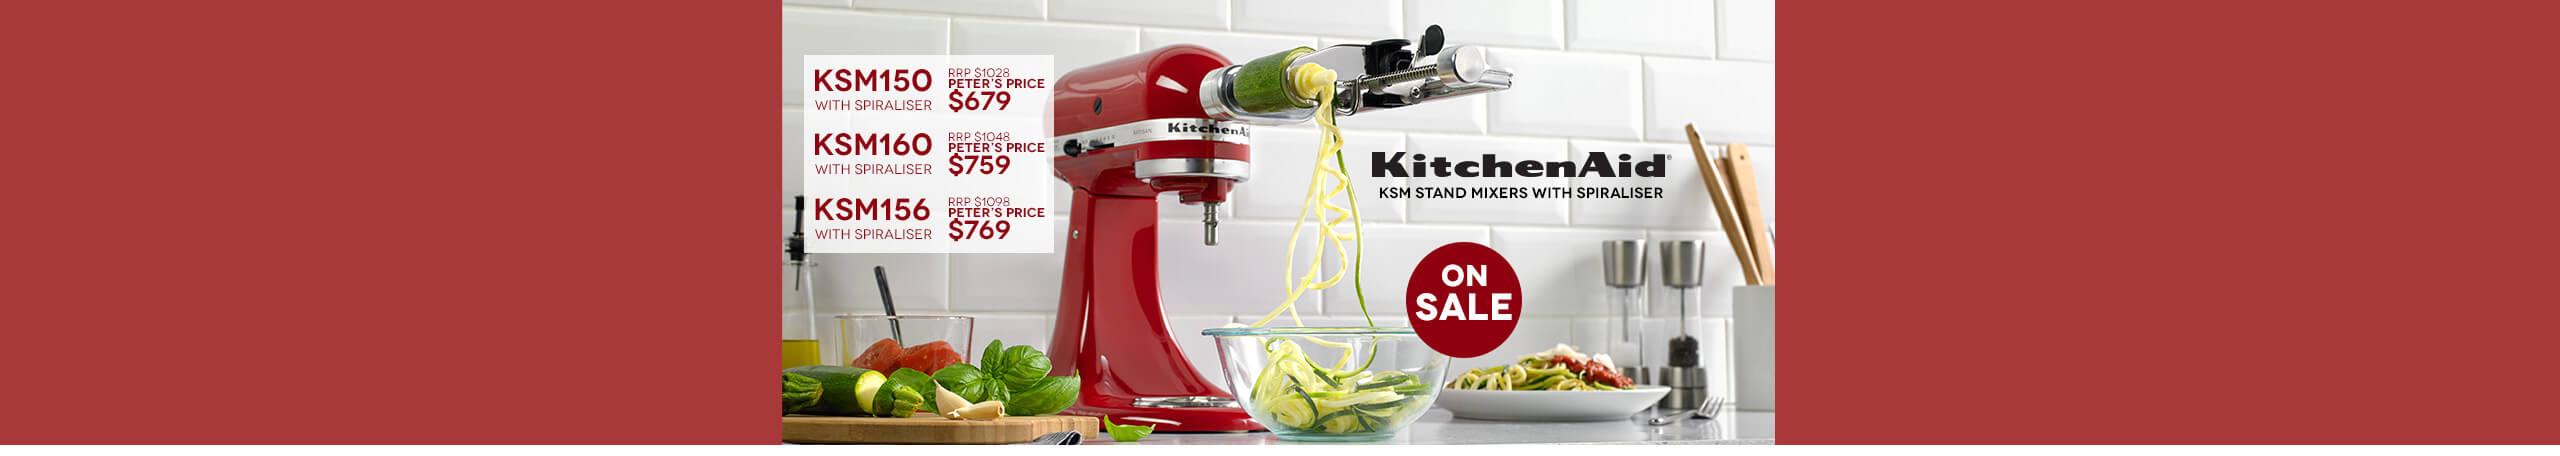 KitchenAid Stand Mixers with Spiraliser